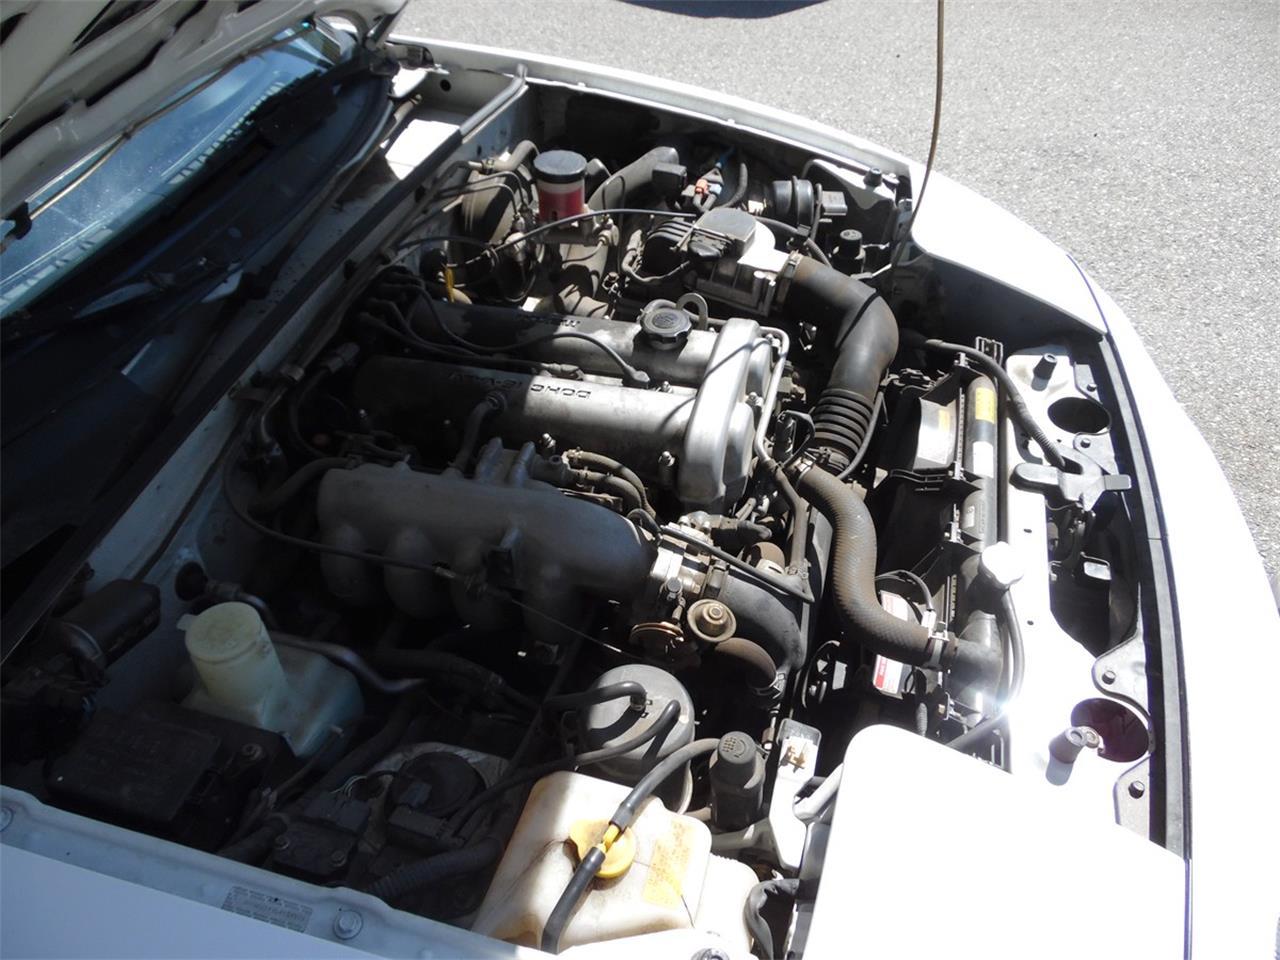 Large Picture of '90 Mazda Miata located in Redlands California - $9,995.00 - PVWW